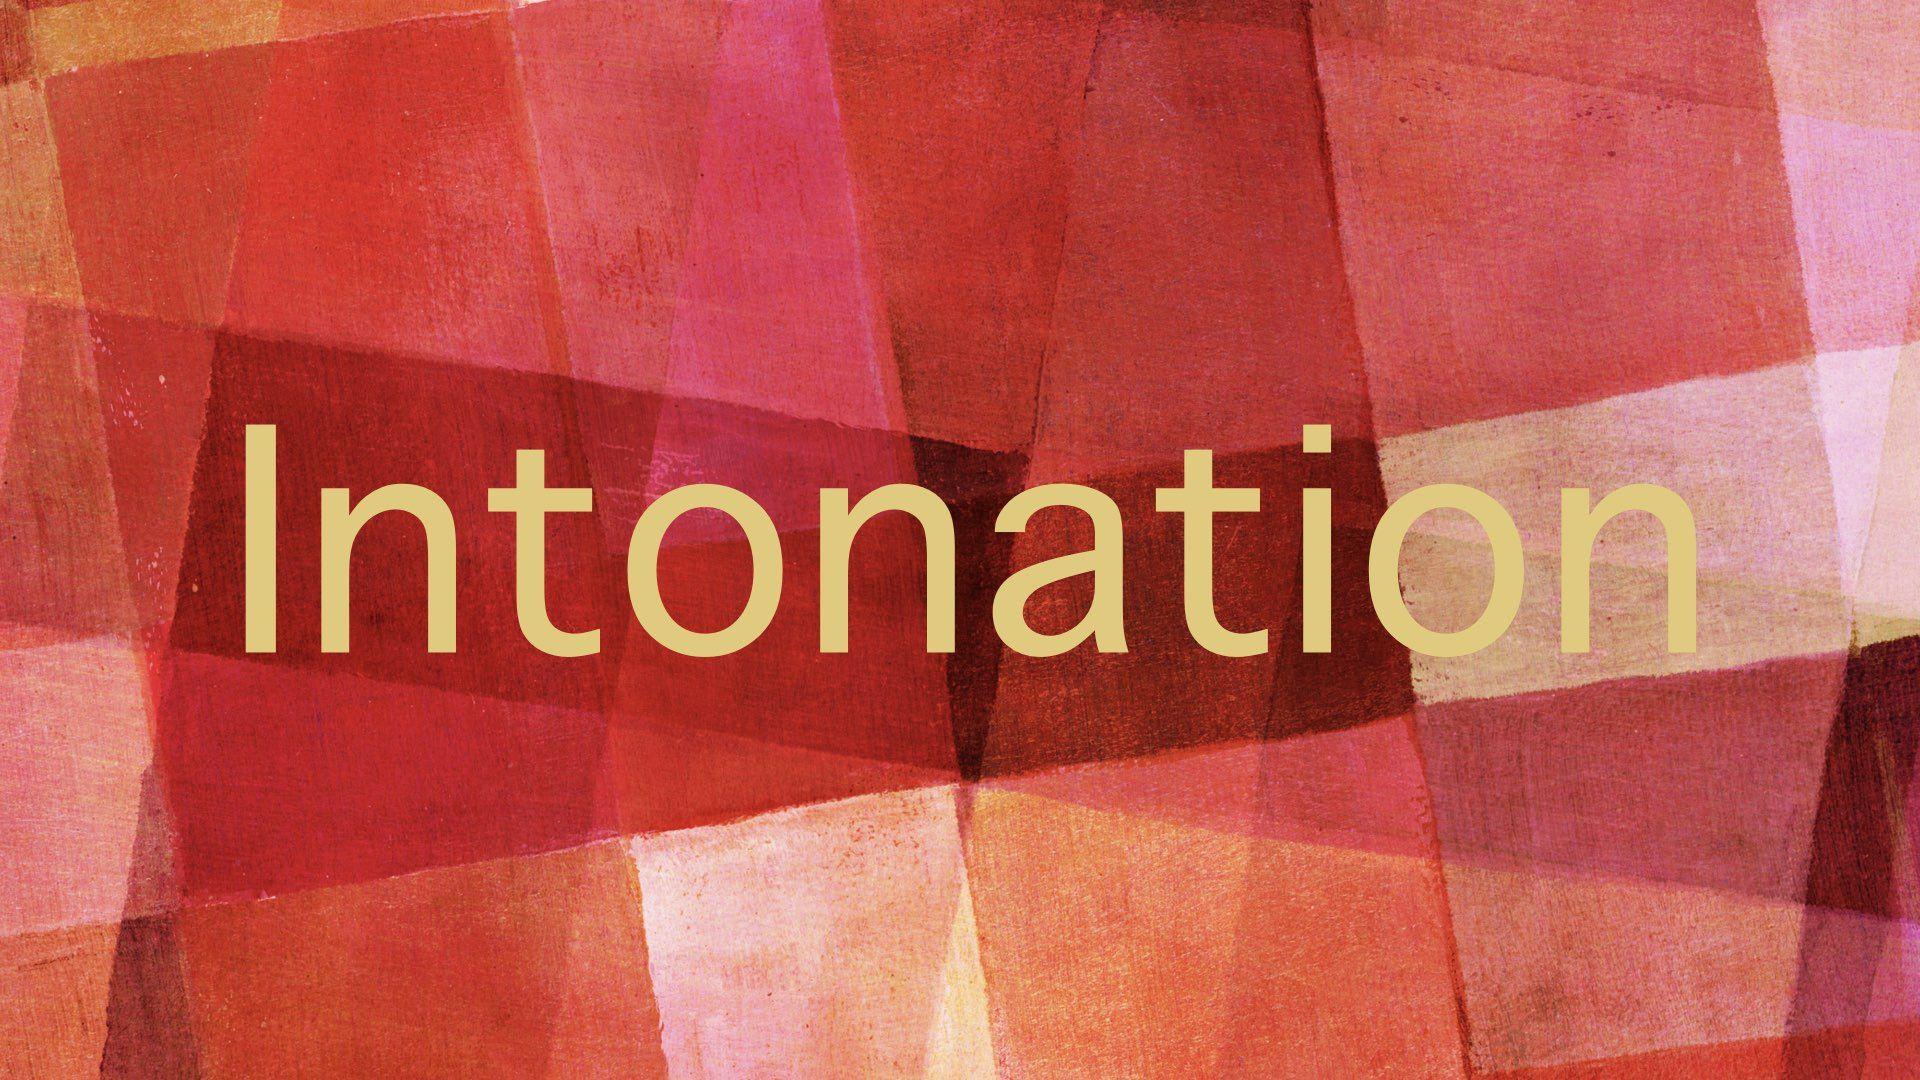 Practice Intonation In